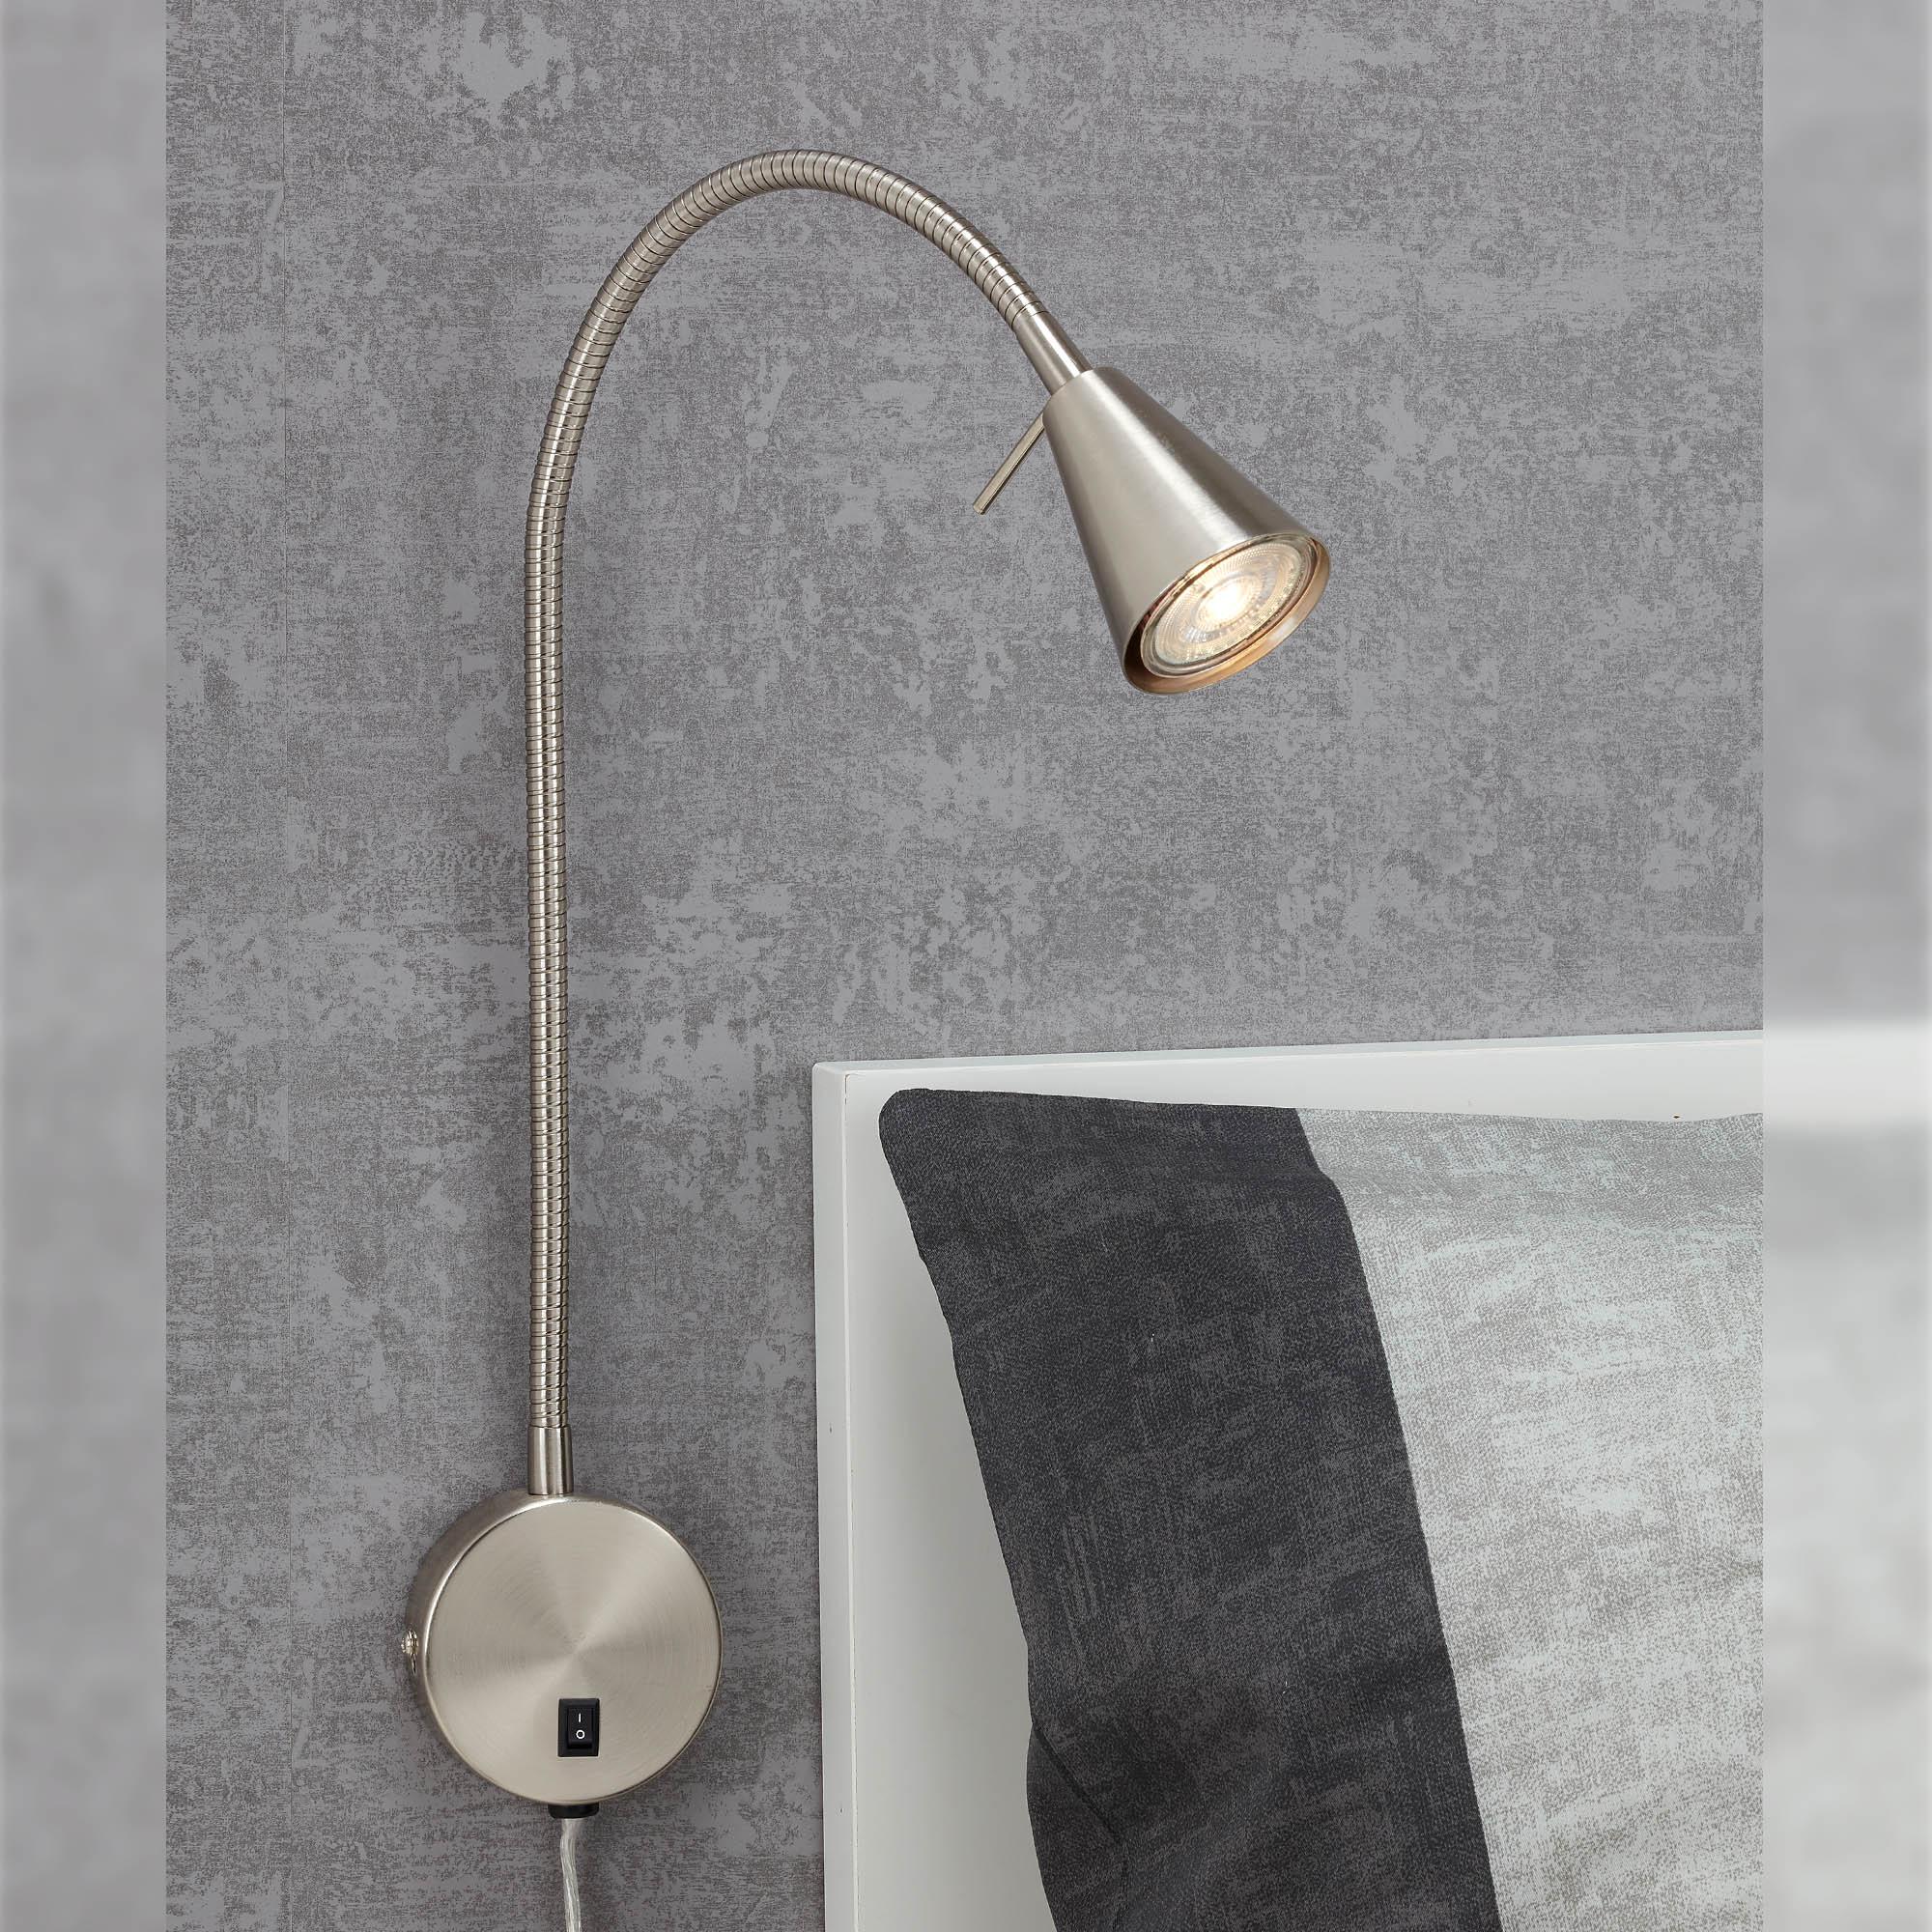 LED Wandleuchte, 45 cm, 5 W, Matt-Nickel